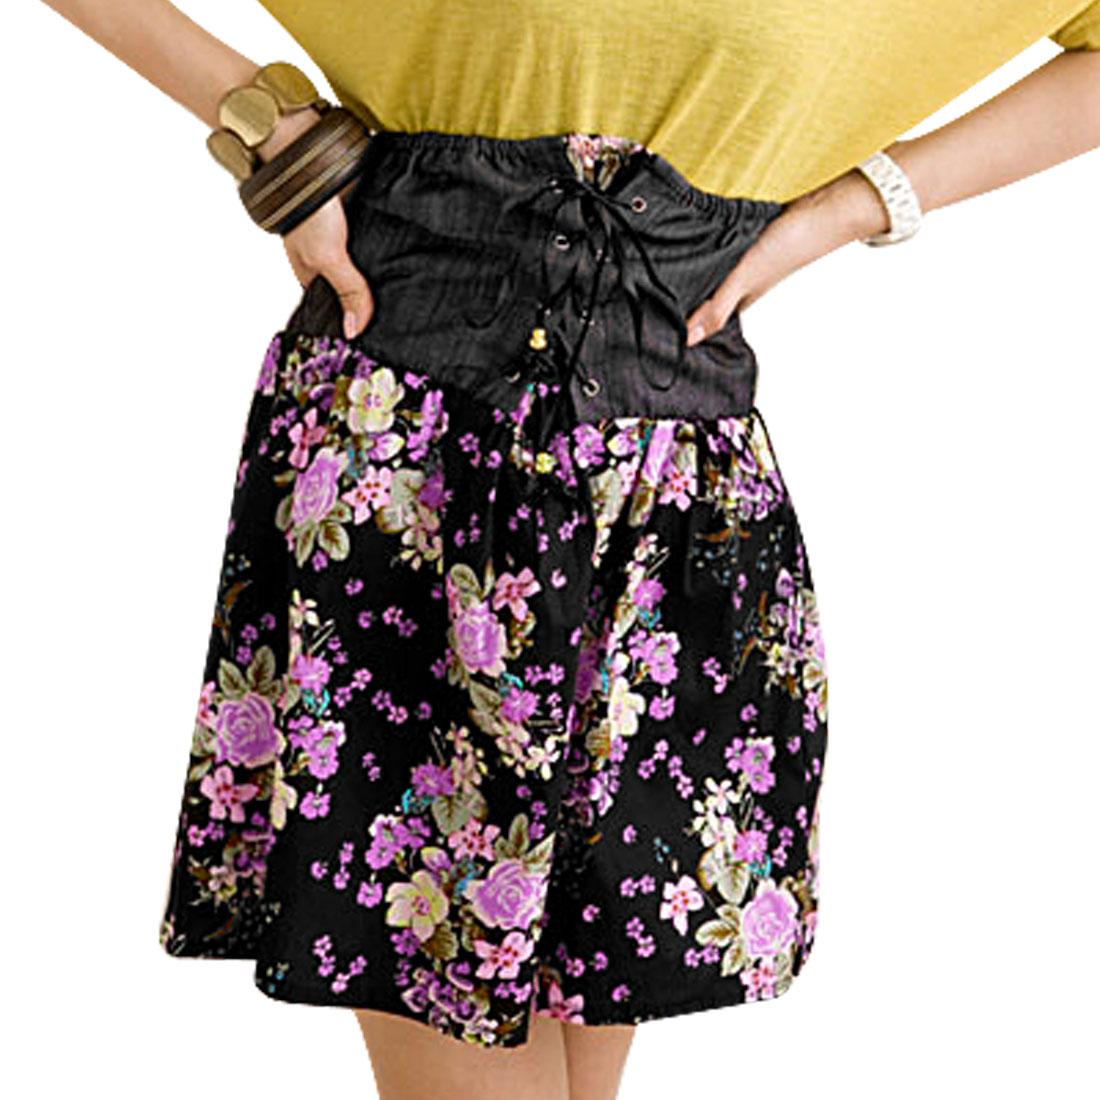 Ladies Flower Elastic Ruffled Cross Strap Front Skirt XS